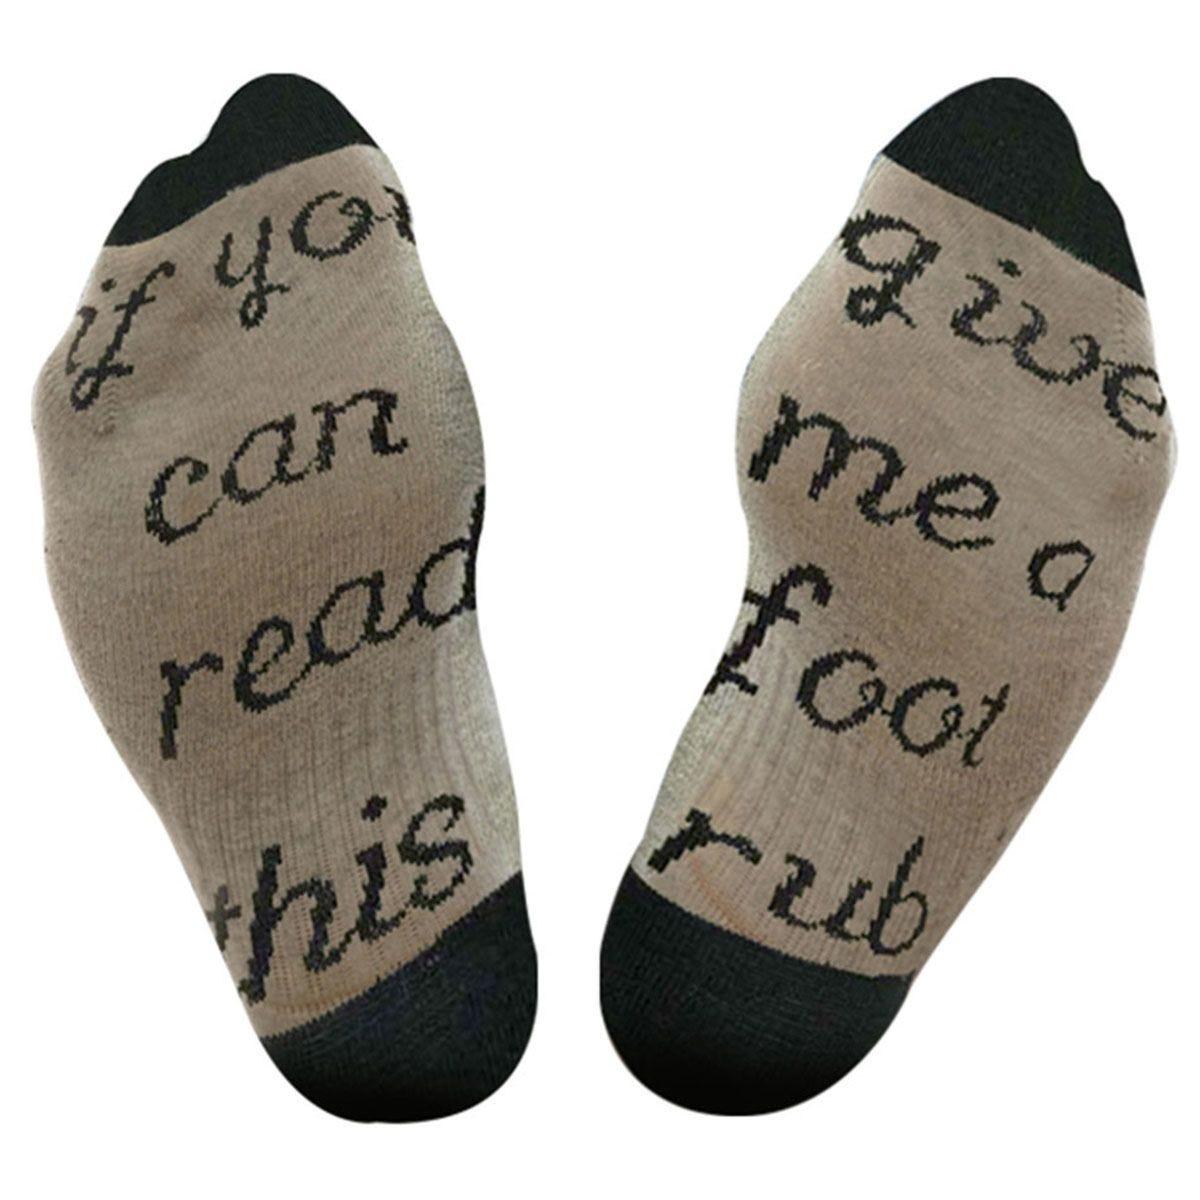 Flo Slogan Socks